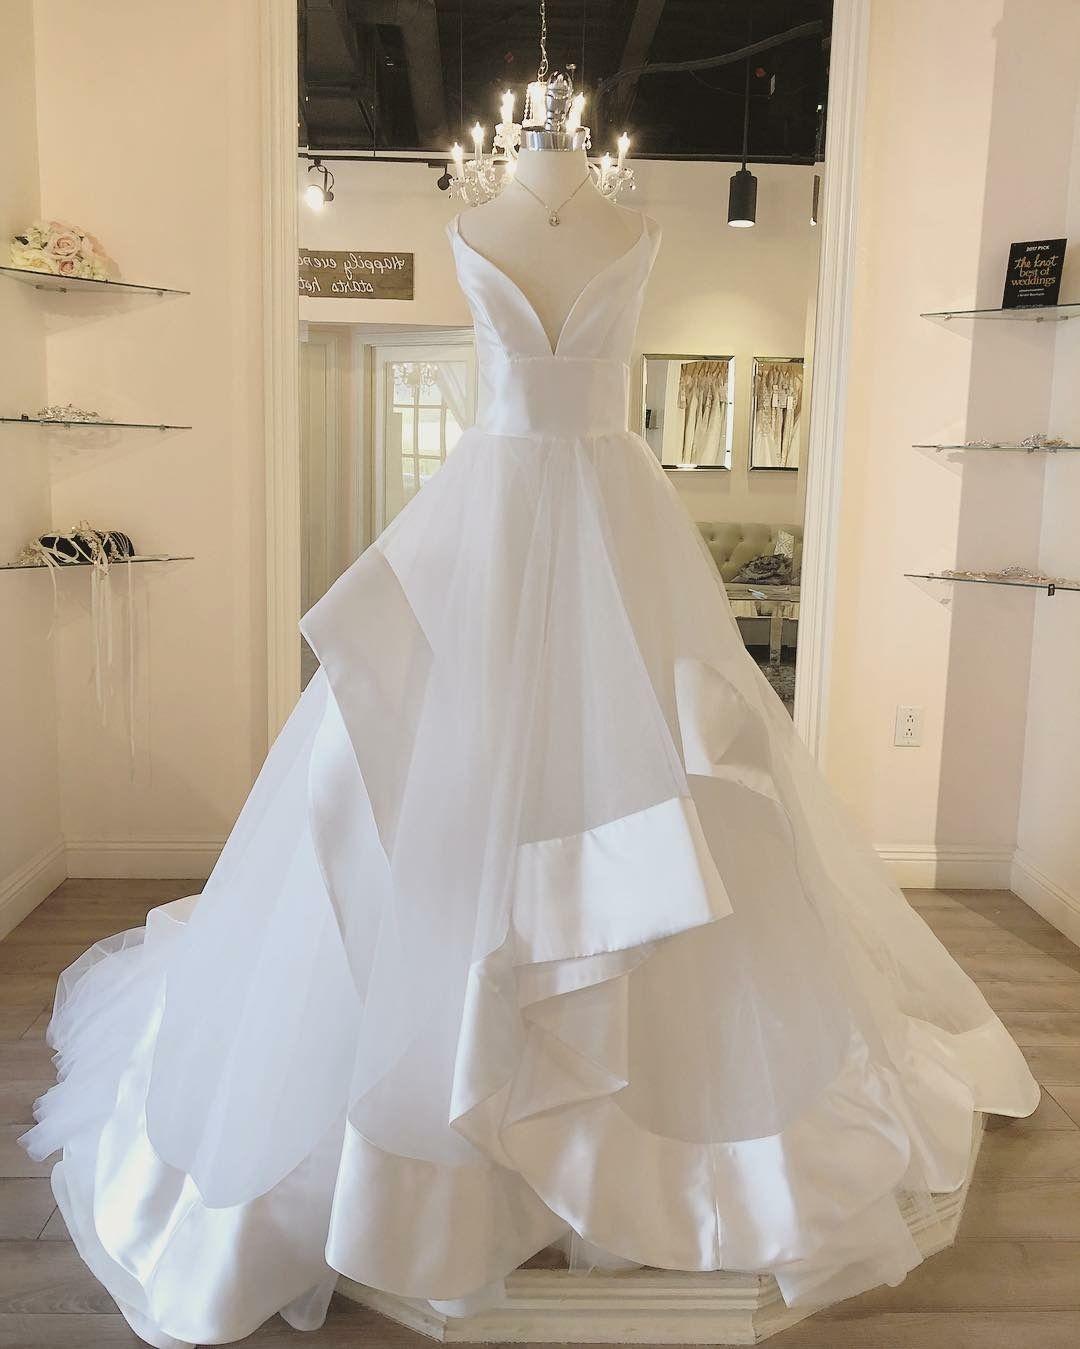 Hayley Paige Andi Ballgown Weddingdress Elegant Modern Gown With Satin Trim J Brid Wedding Dress Long Sleeve Dream Wedding Dresses Wedding Dresses Satin